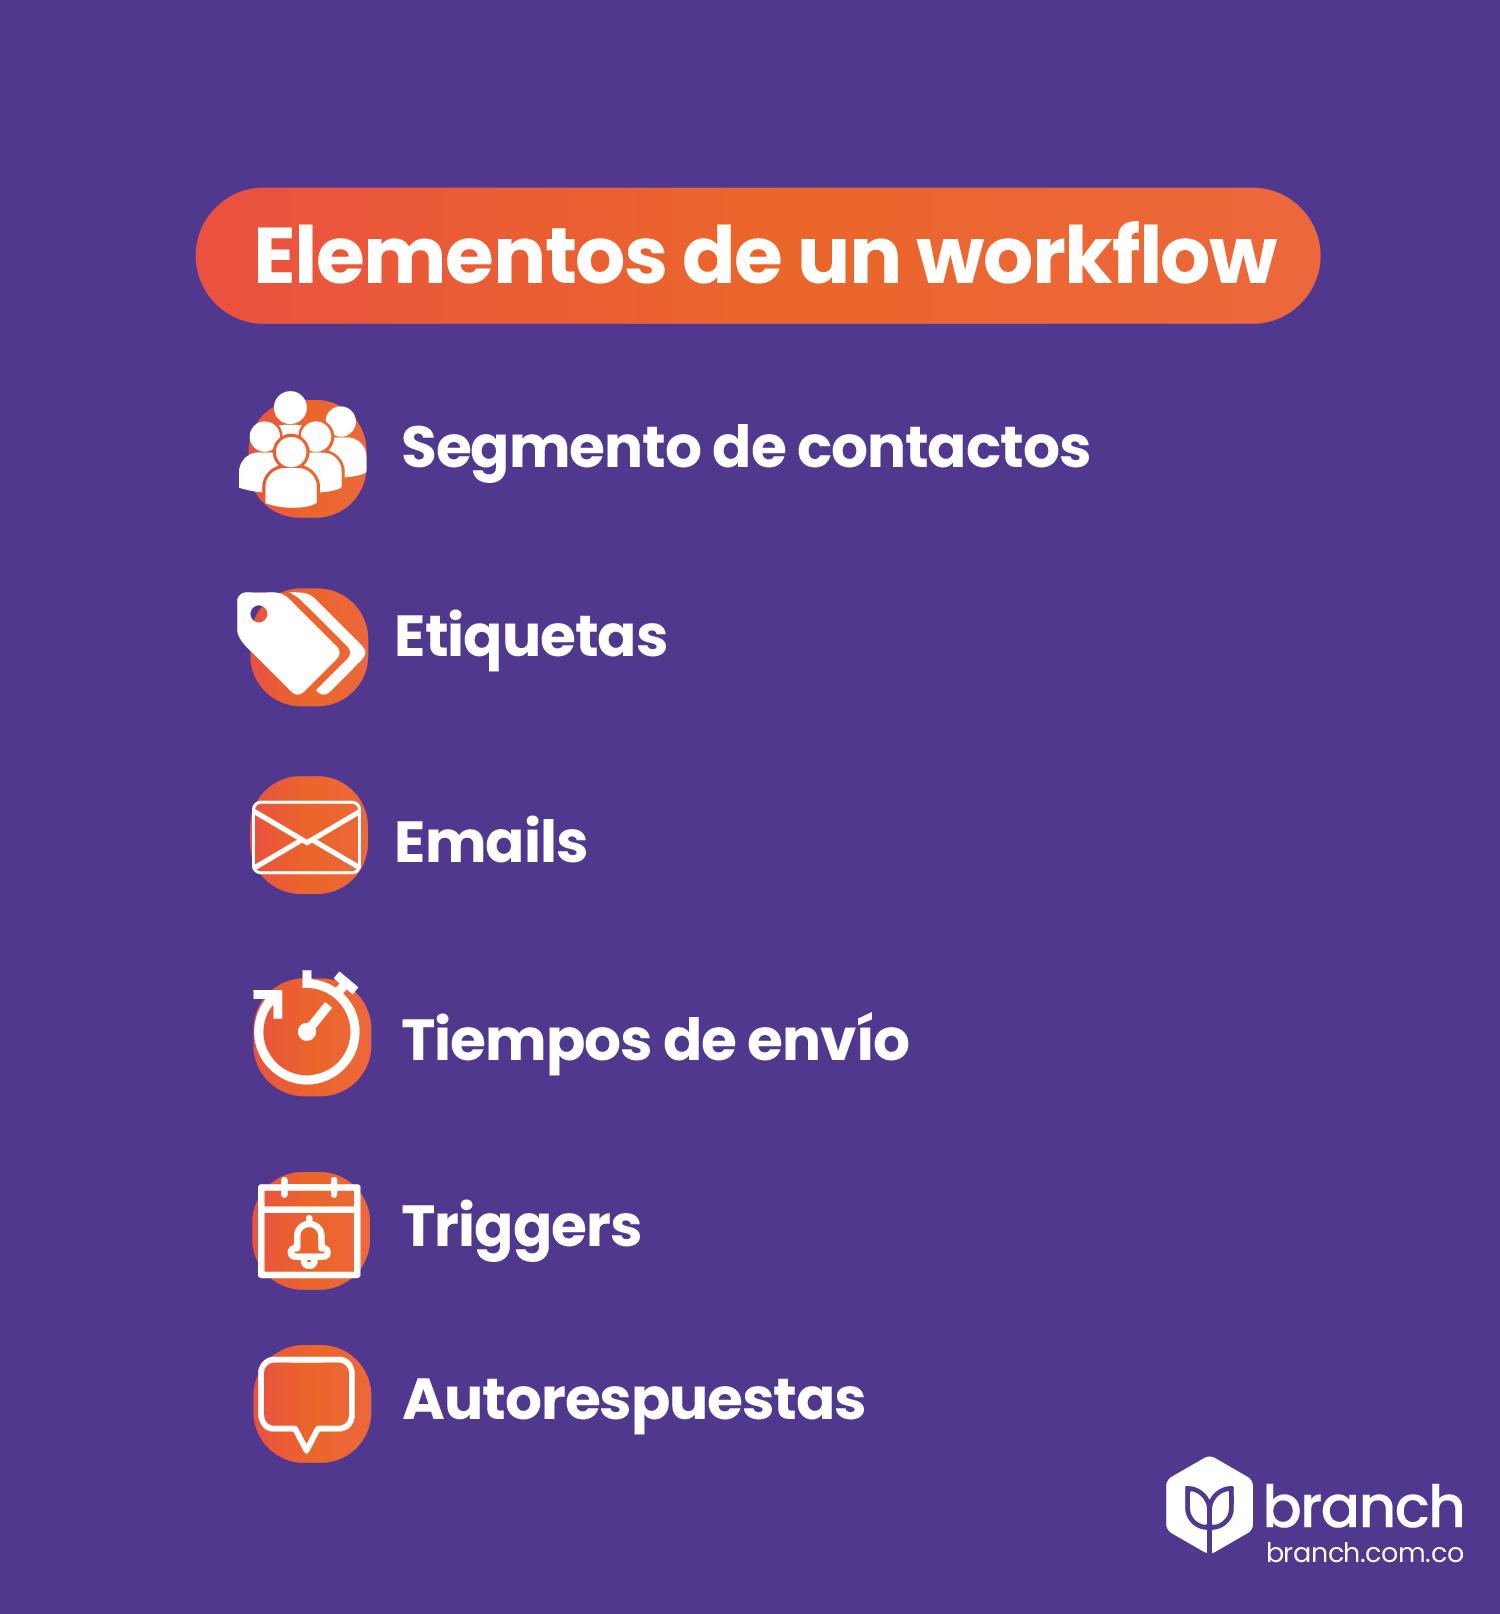 infografia-elementos-de-un-workflow